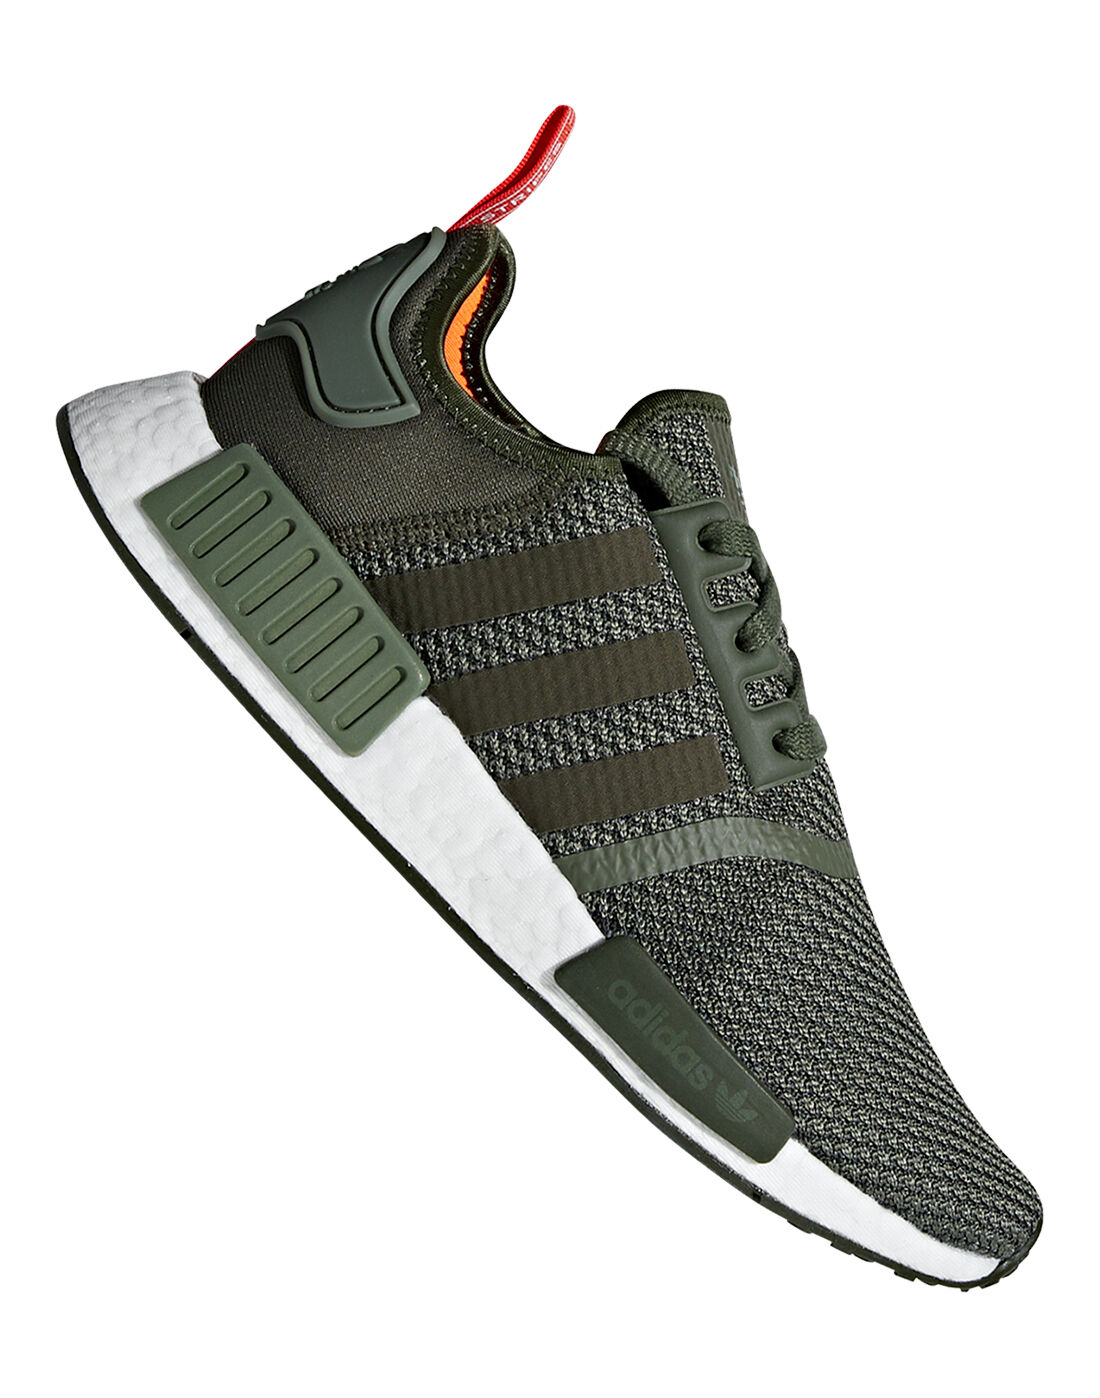 Men's adidas Originals NMD R1 | Green | Life Style Sports